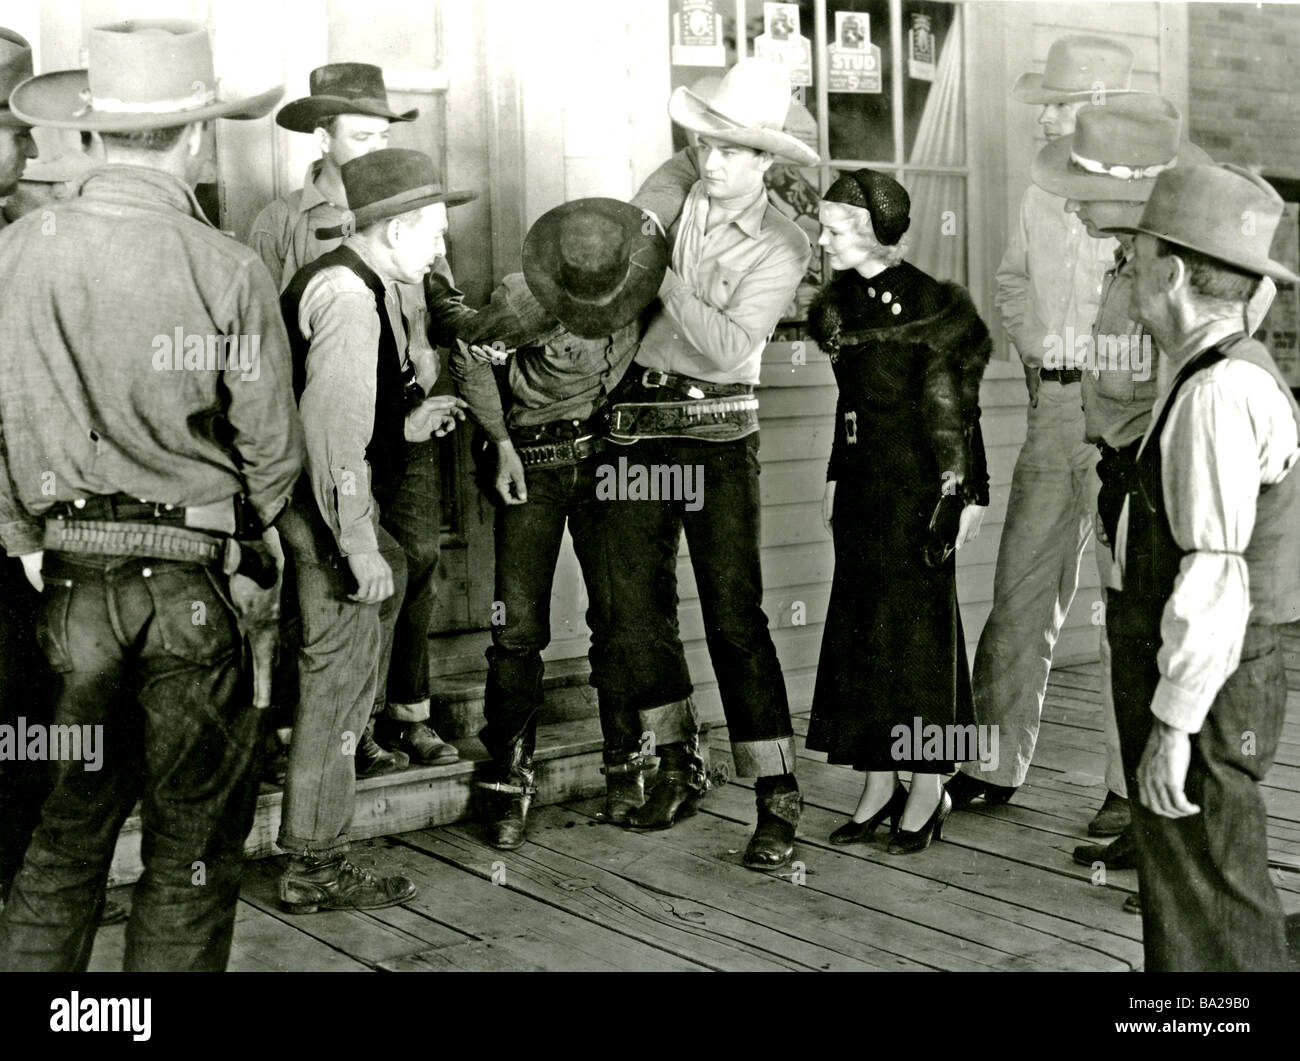 e51a43ea61cc6 THE STAR PACKER 1934 Monogram Lone Star film with John Wayne in white  stetson